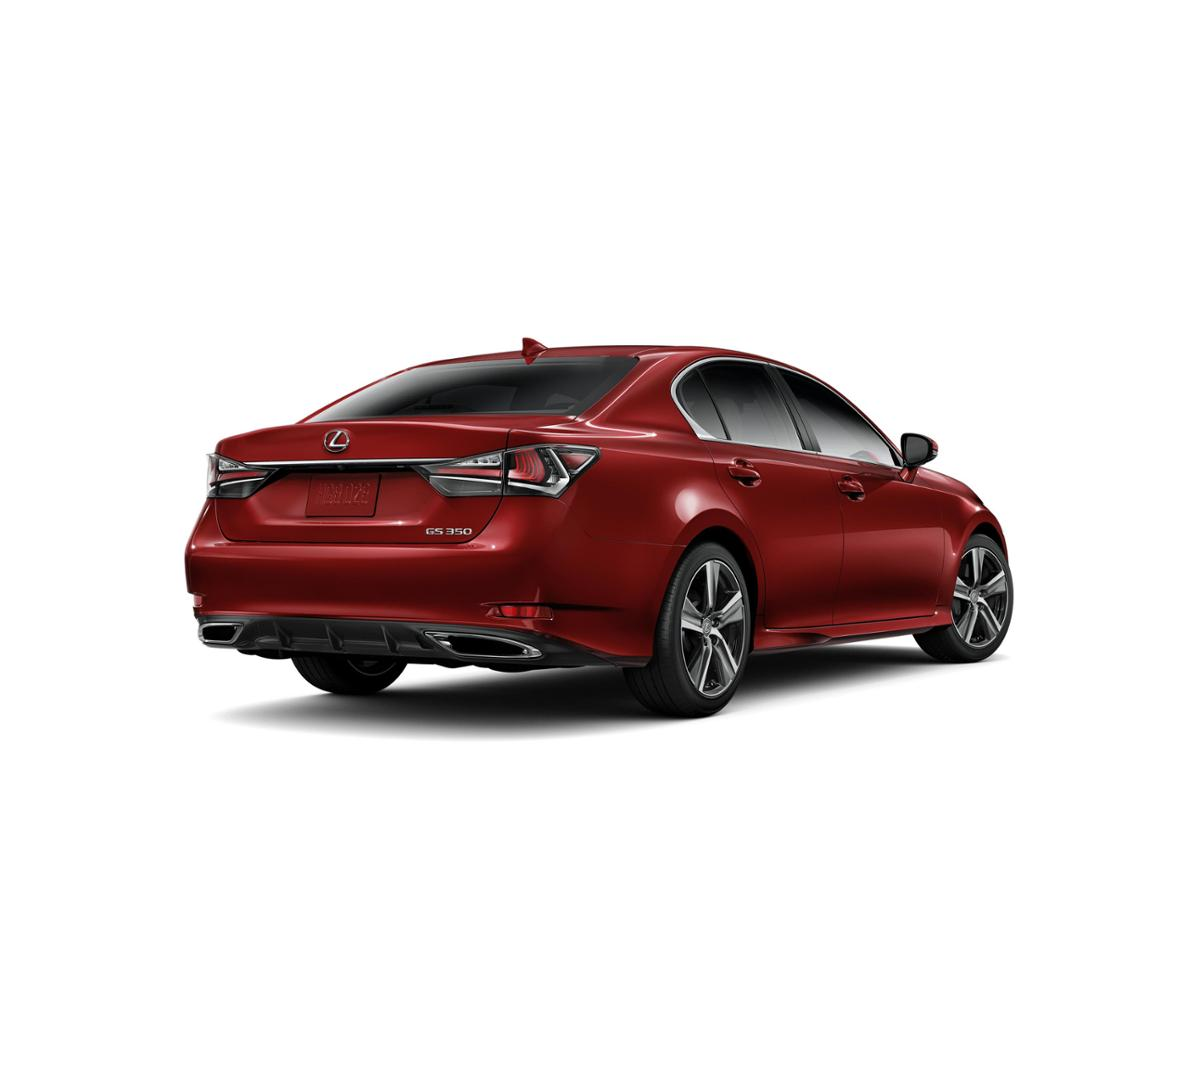 Lexus Gs For Sale: Find A 2018 Lexus GS 350 For Sale In Lubbock, VIN